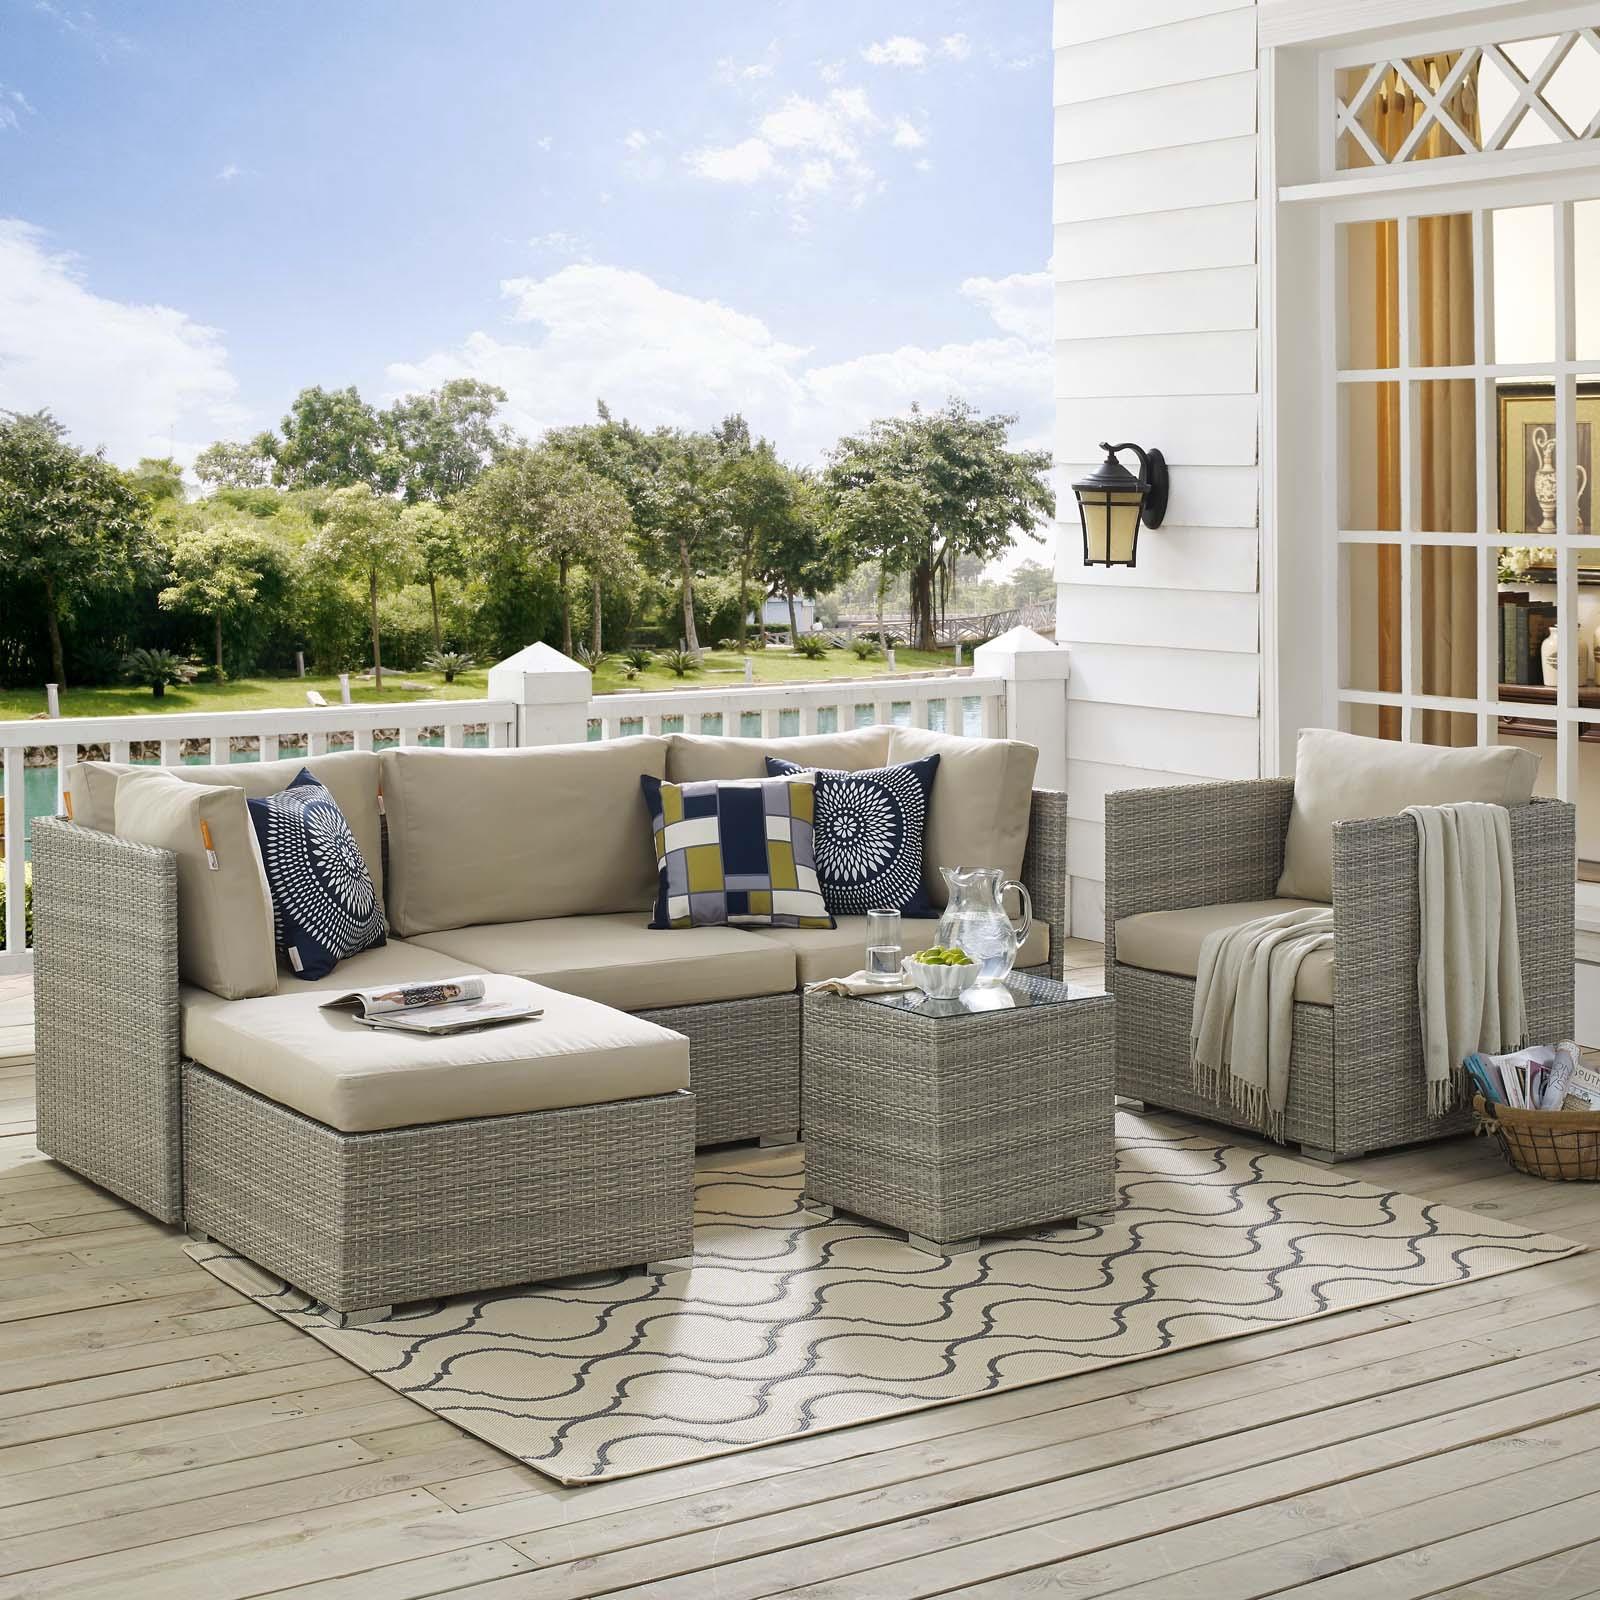 Repose 6 Piece Outdoor Patio Sunbrella® Sectional Set in Light Gray Beige